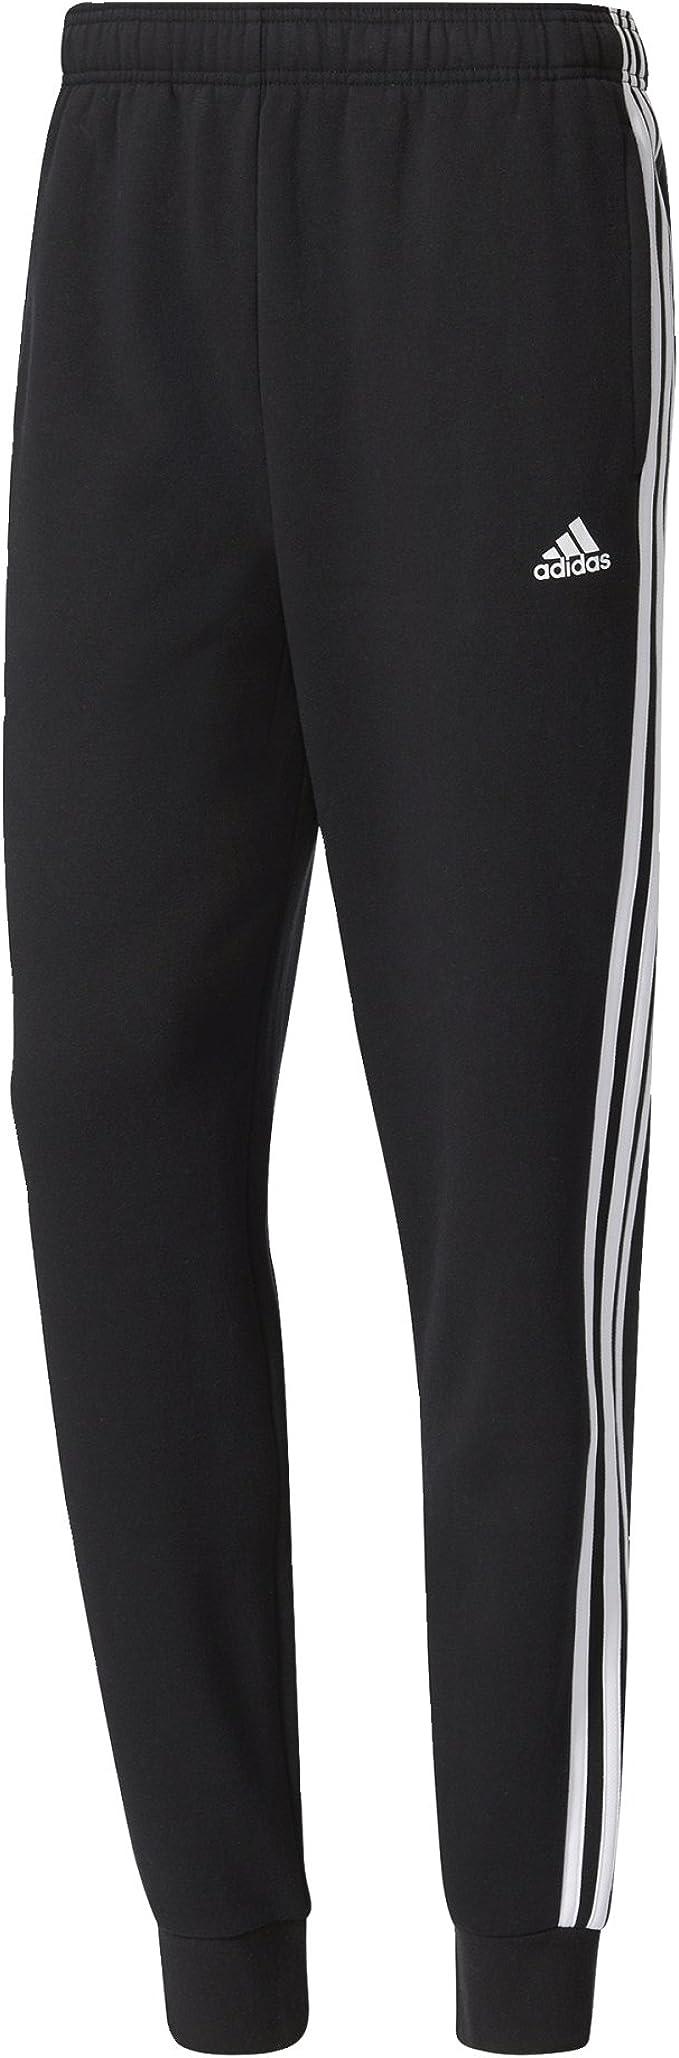 adidas Herren Hose Essentials 3-Stripes Tapered Cuffed Fleece